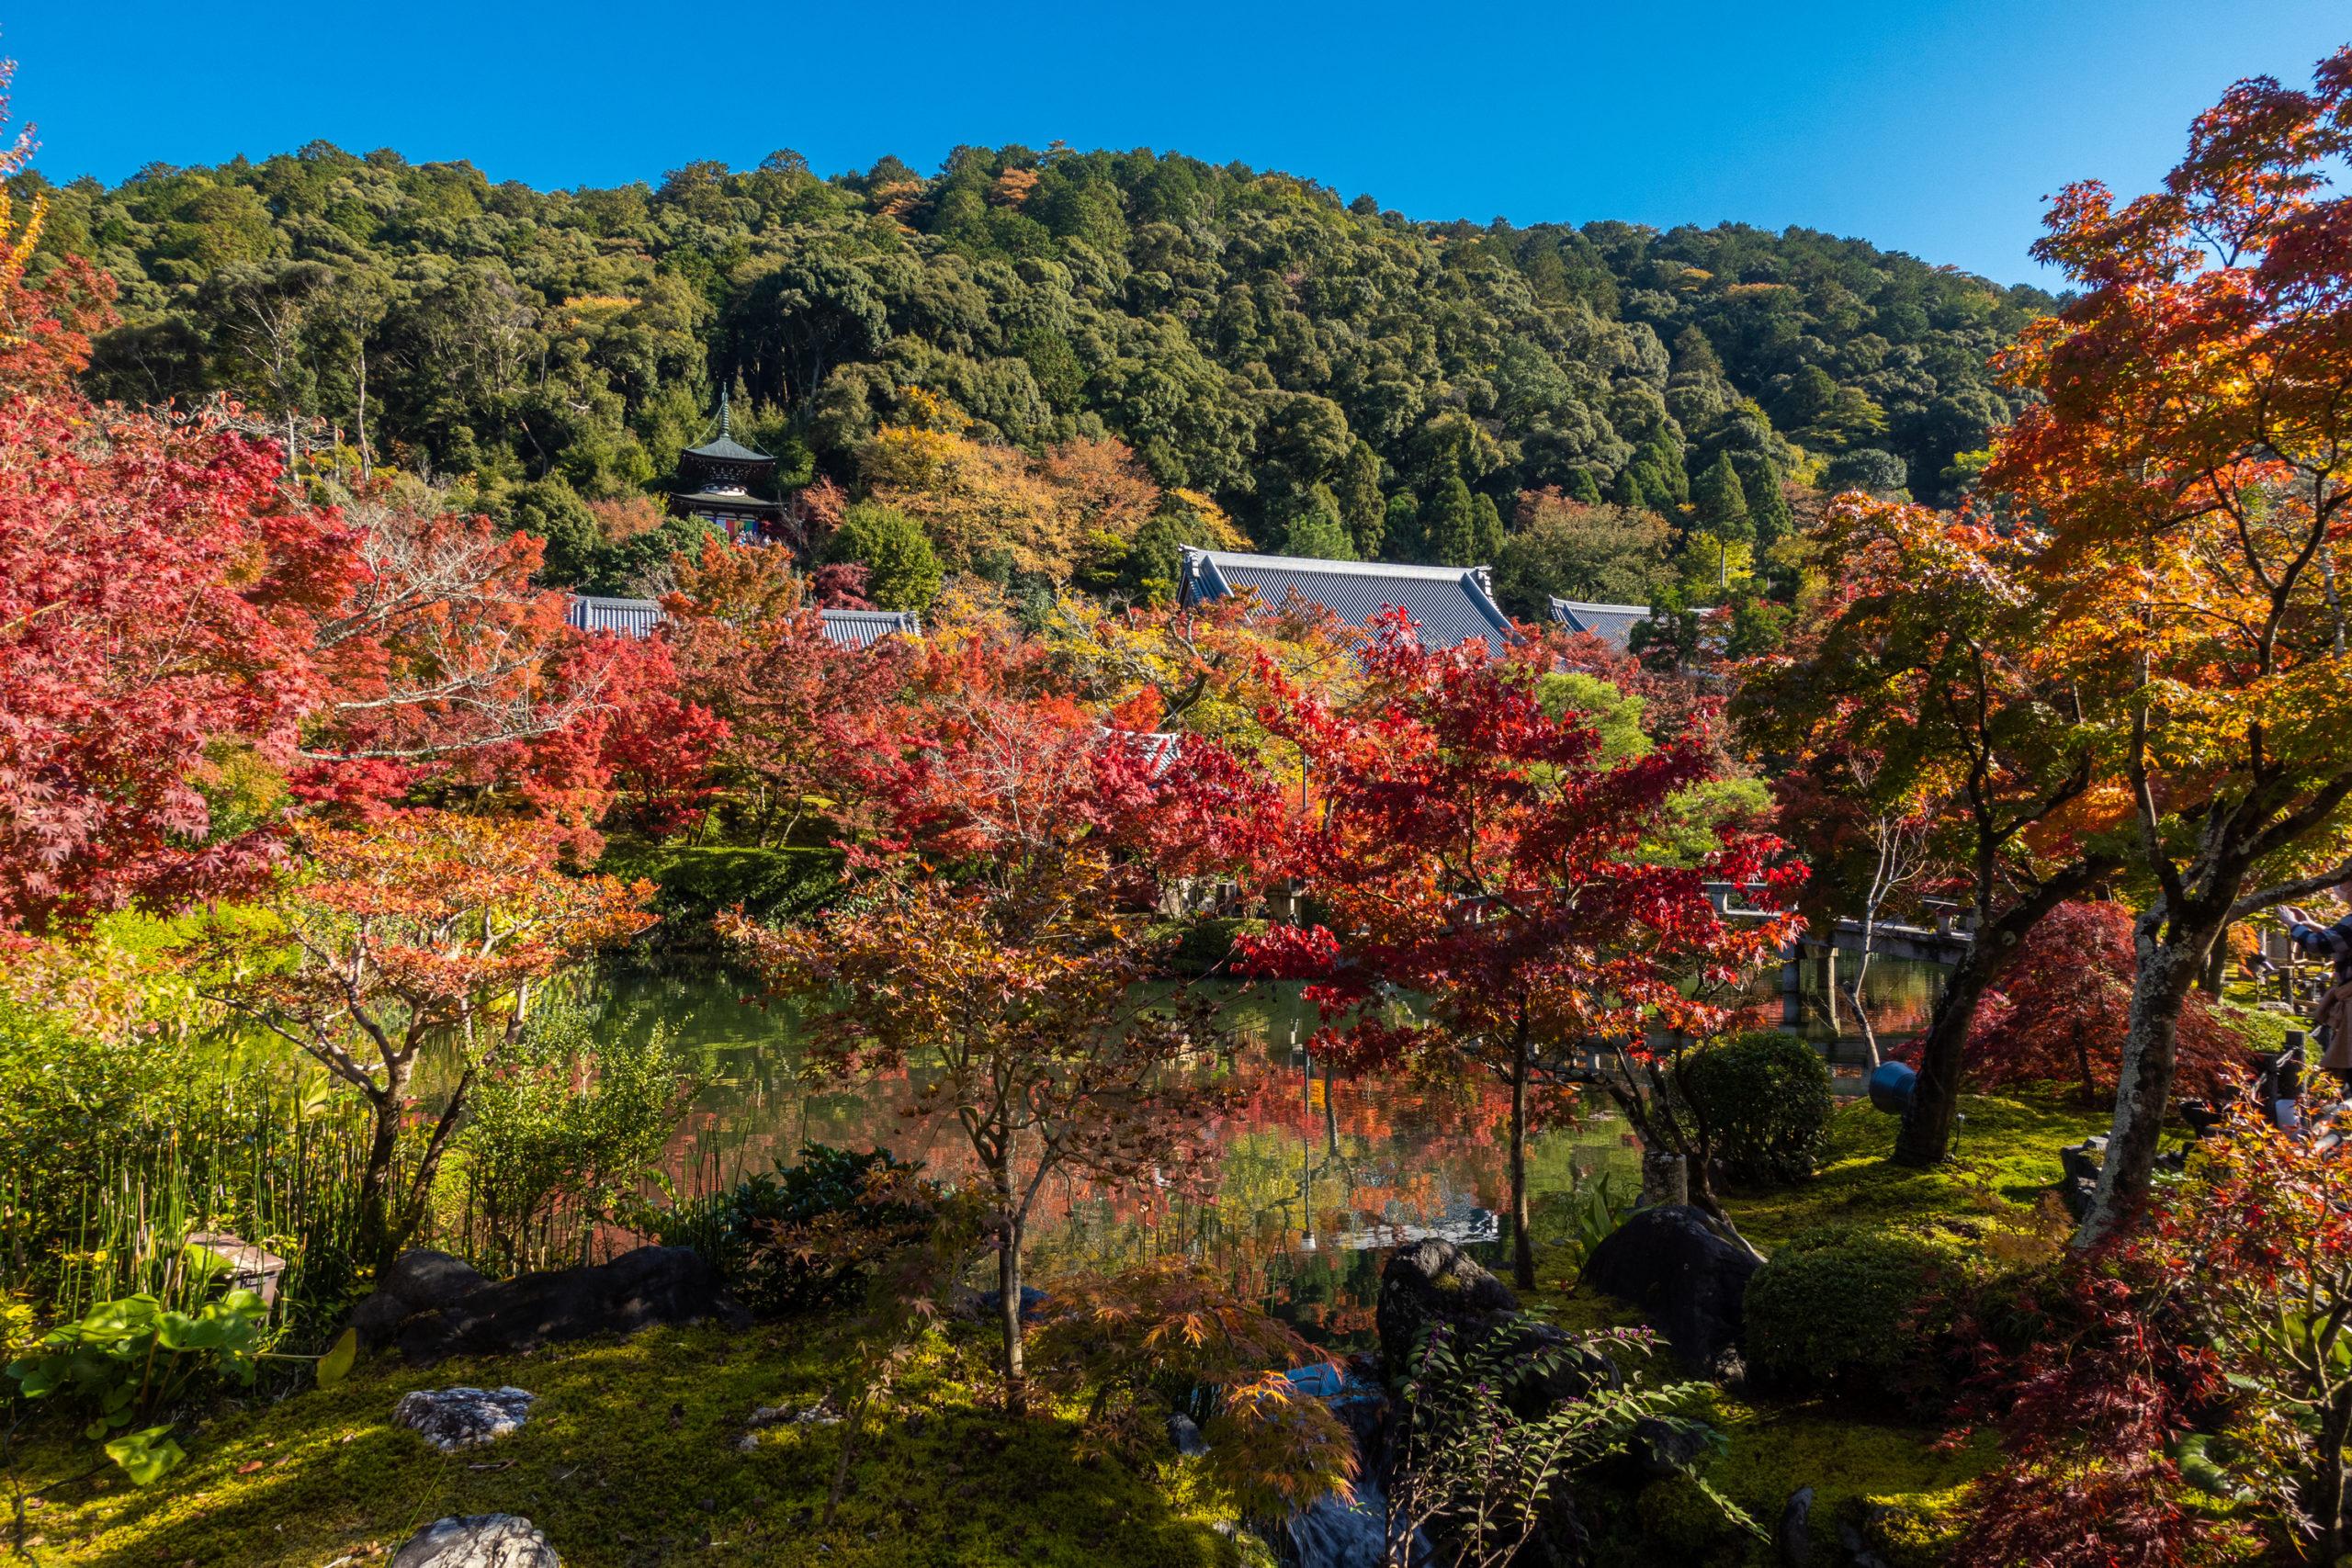 DSC00704-scaled 京都  永観堂-禅林寺(池に映る紅葉の風景が美しい秋におすすめのスポット!撮影した写真の紹介、アクセス情報・ライトアップ情報など)